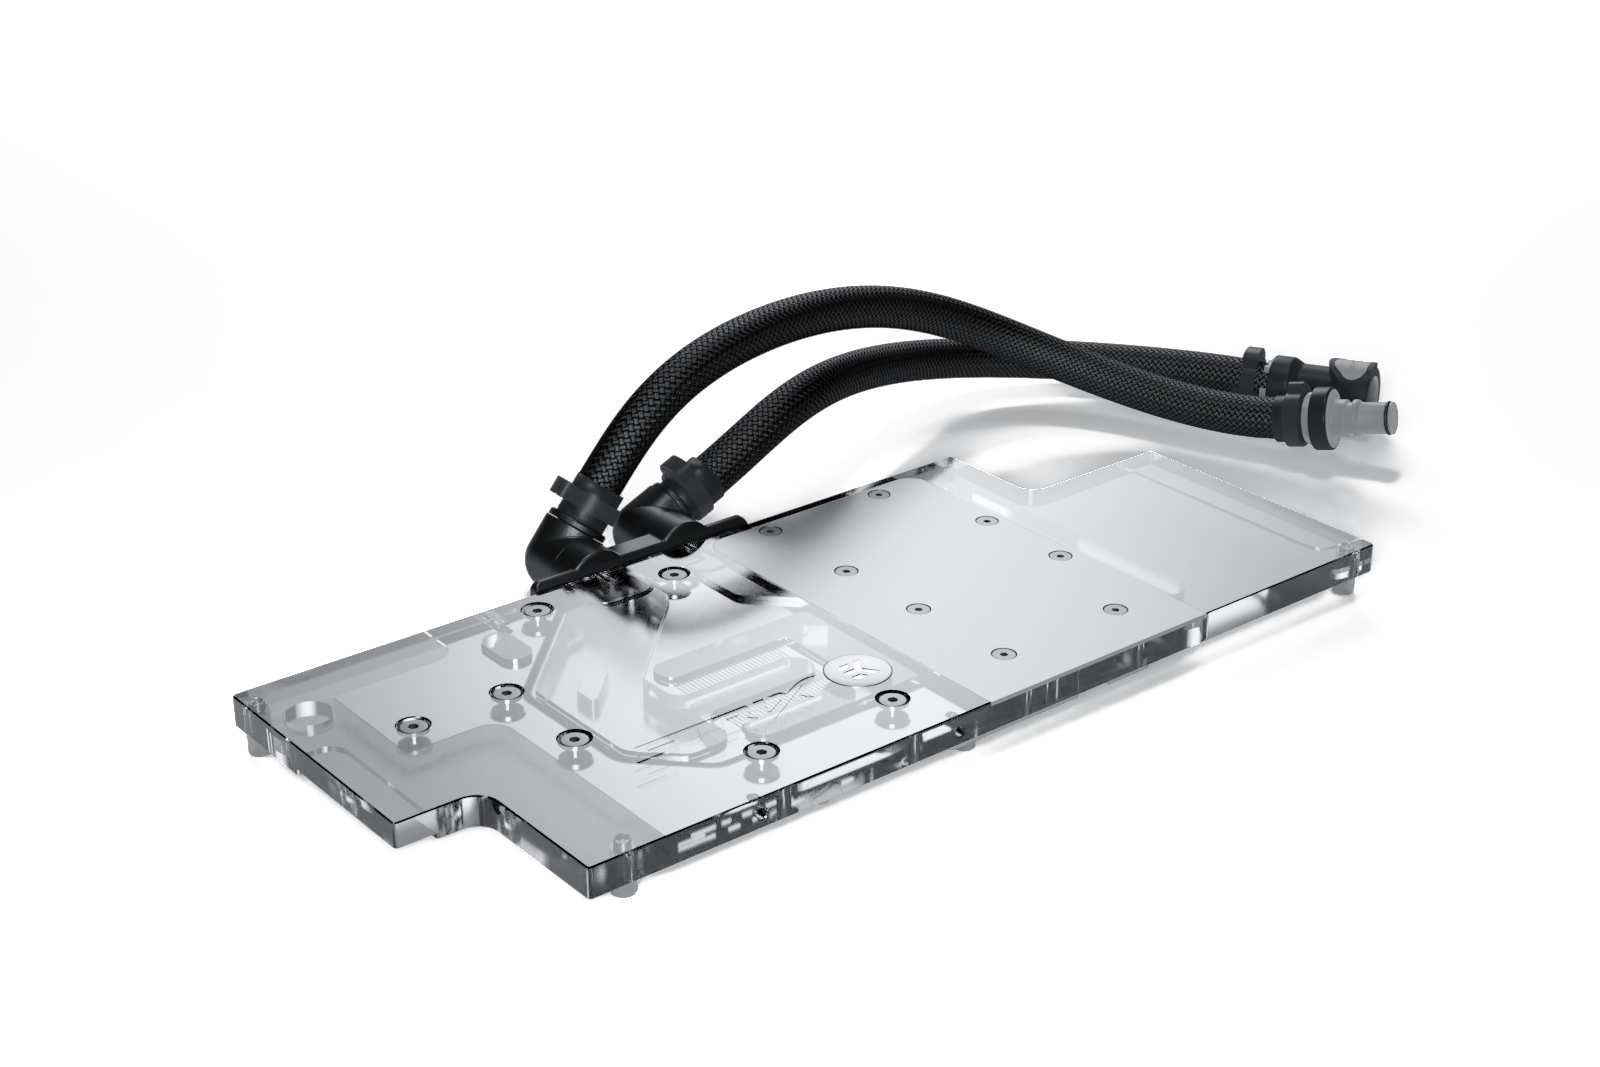 EK-MLC Phoenix GPU Module FC1080 GTX Ti Strix - Nickel (rev. 2.0)